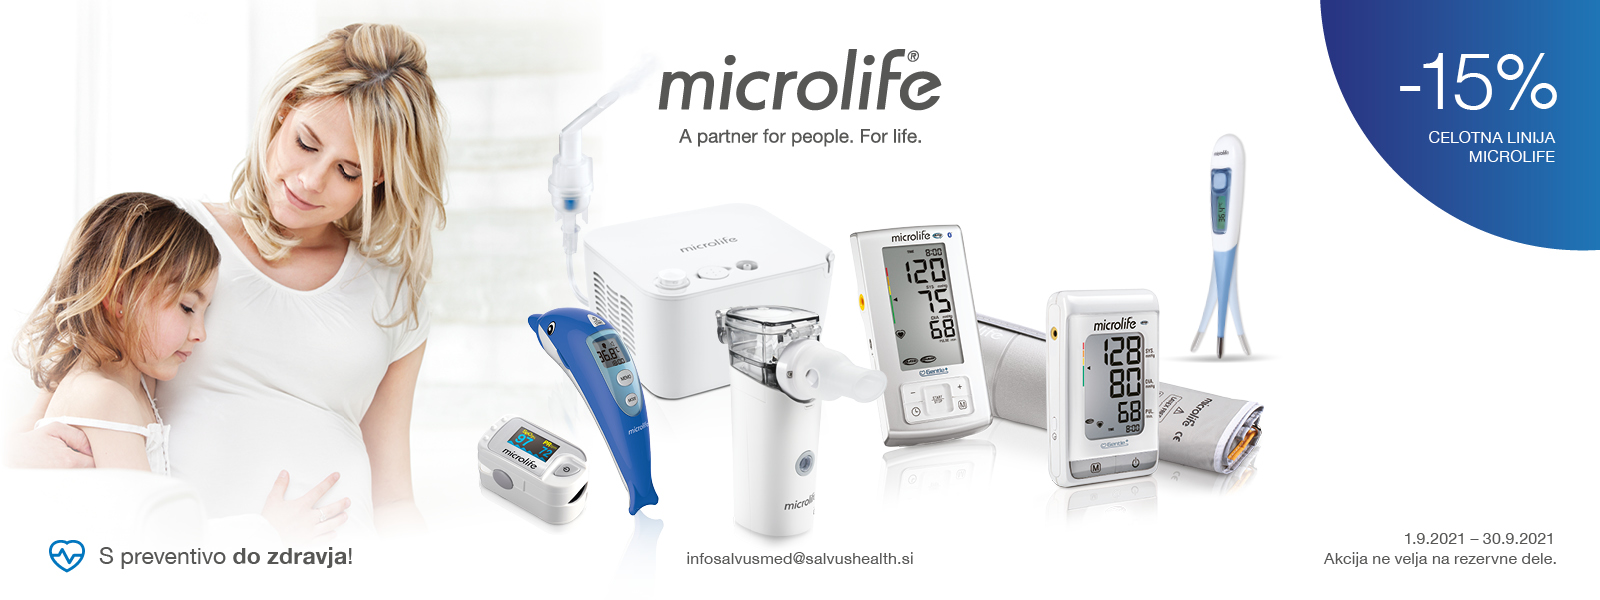 Baner Microlife 800x300